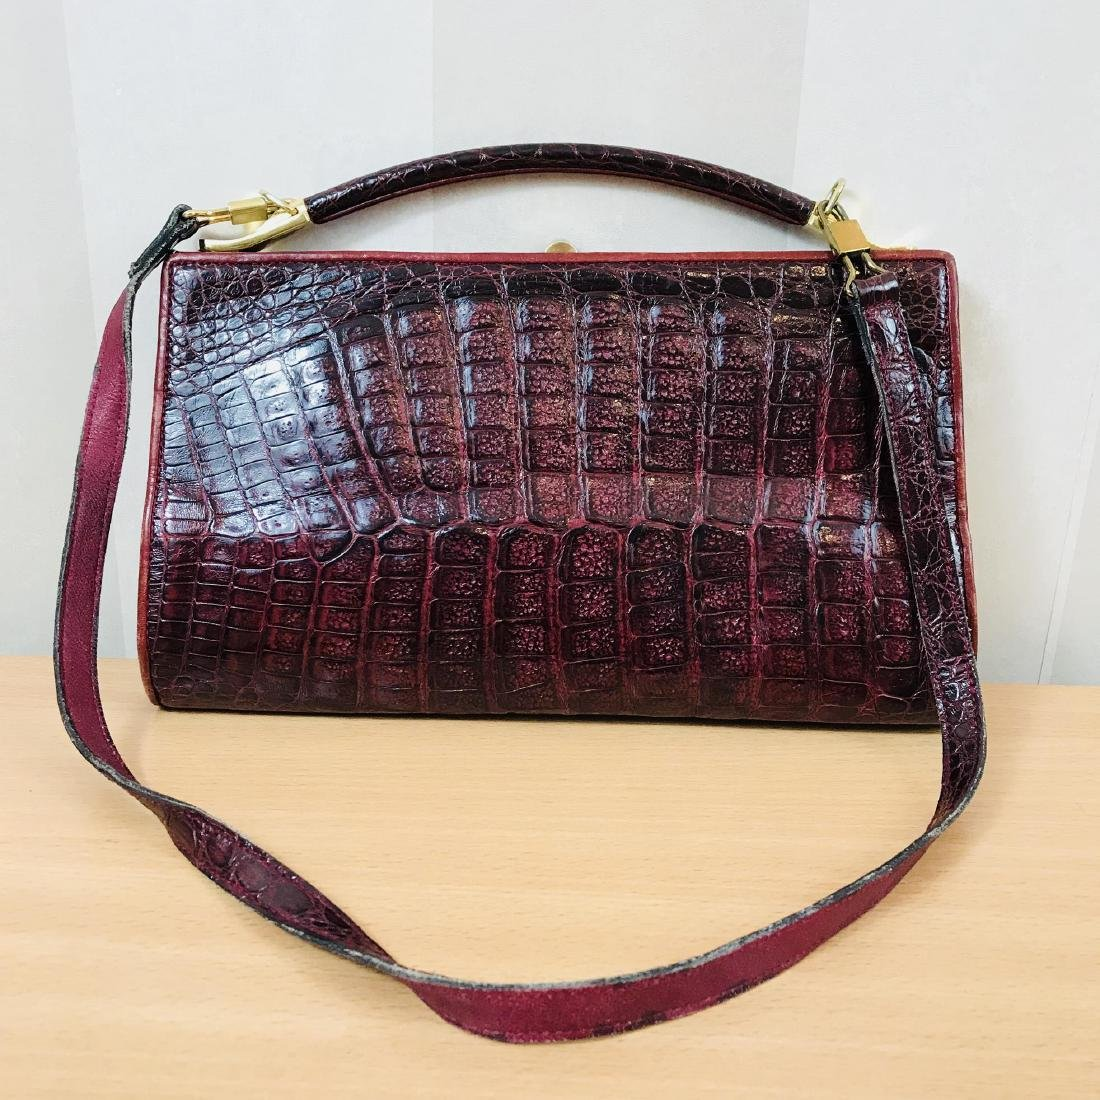 Vintage Bordeaux Crocodile Leather Handbag / Shoulder